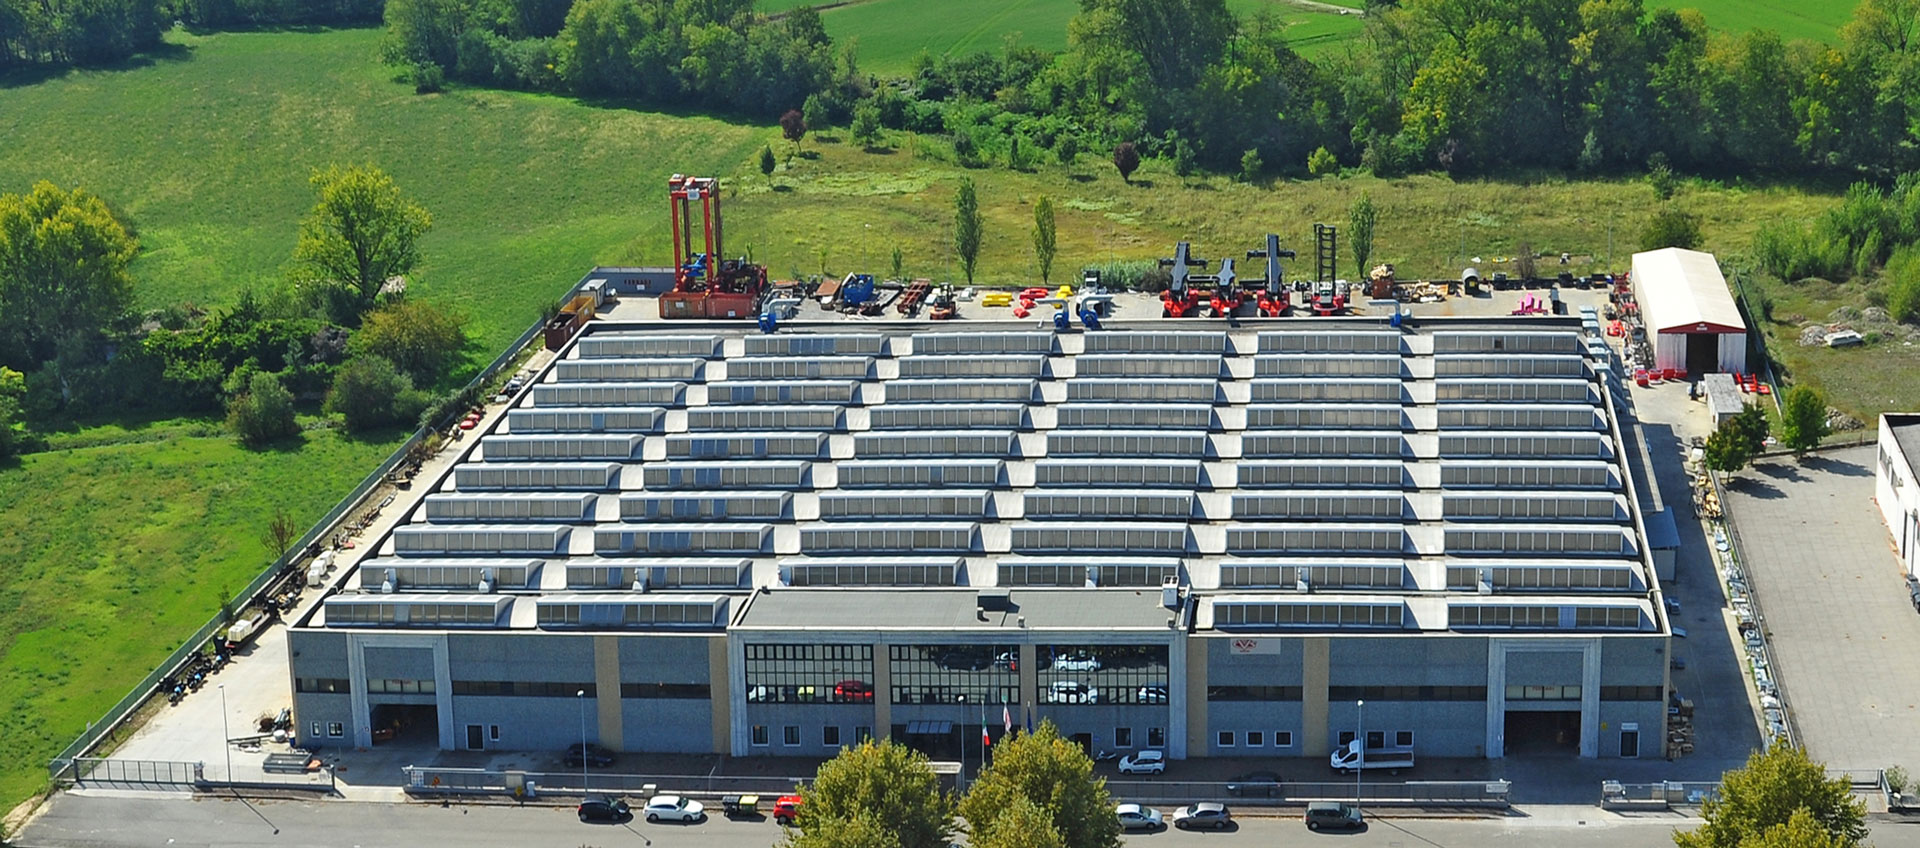 cvs ferrari - company facilities - rovereto